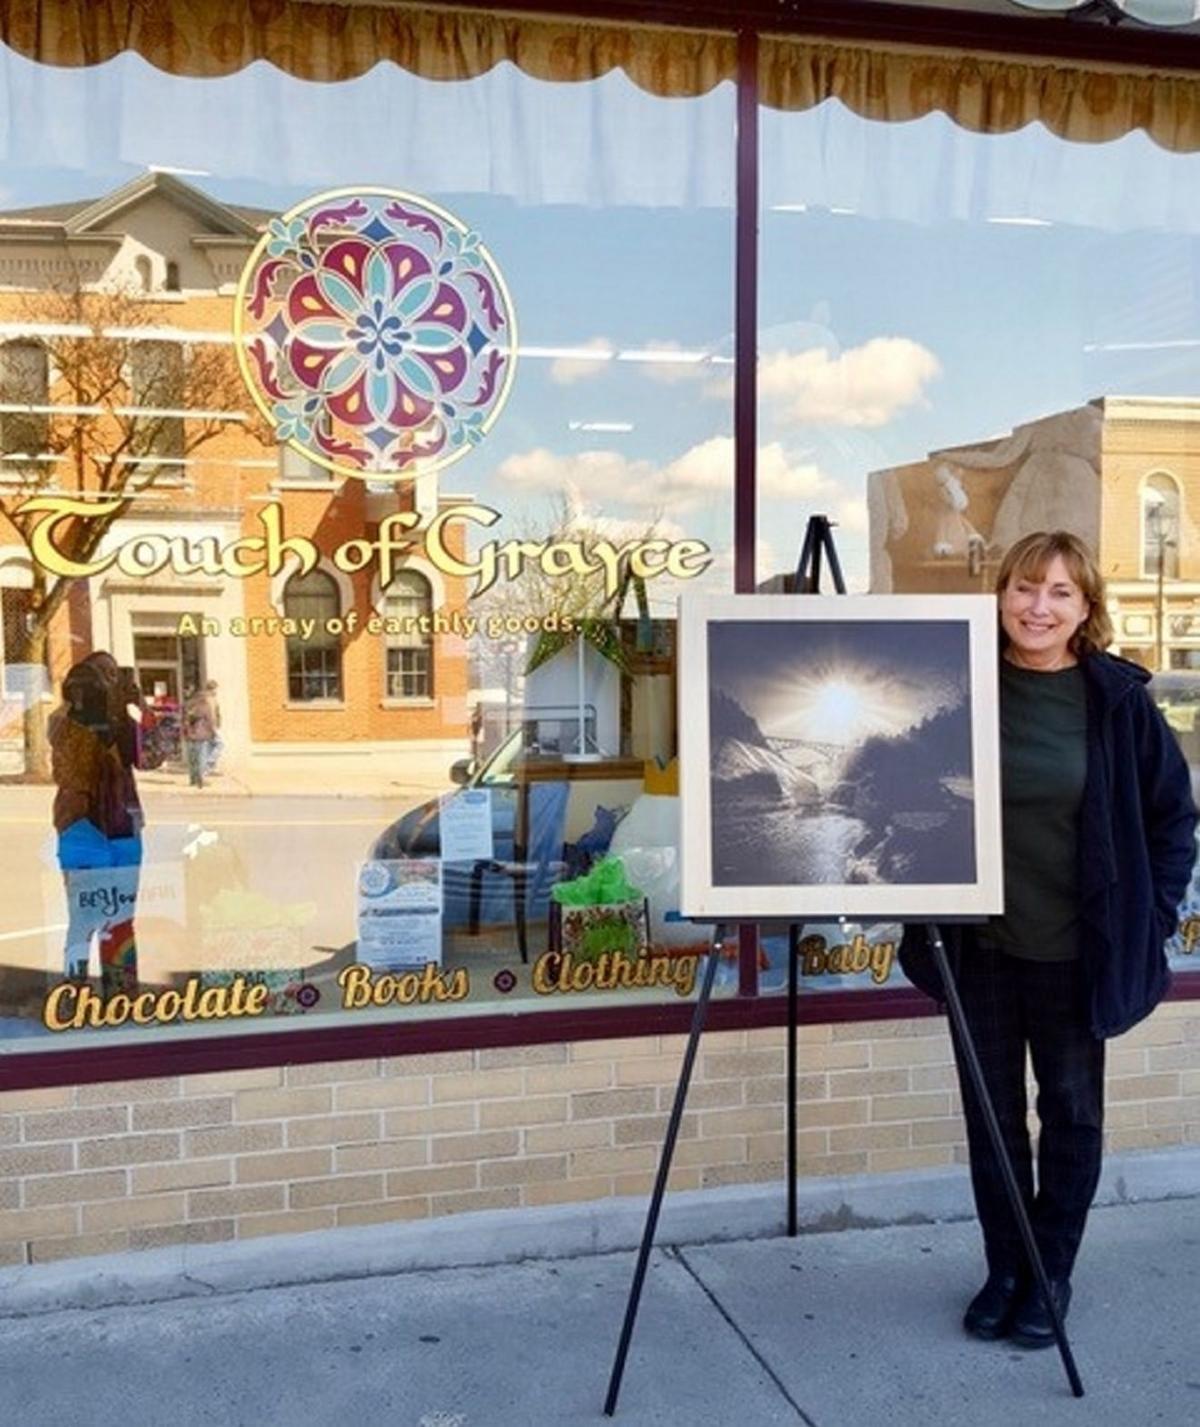 Everyone needs a little inspiration Livingston County art trail taking shape despite pandemic